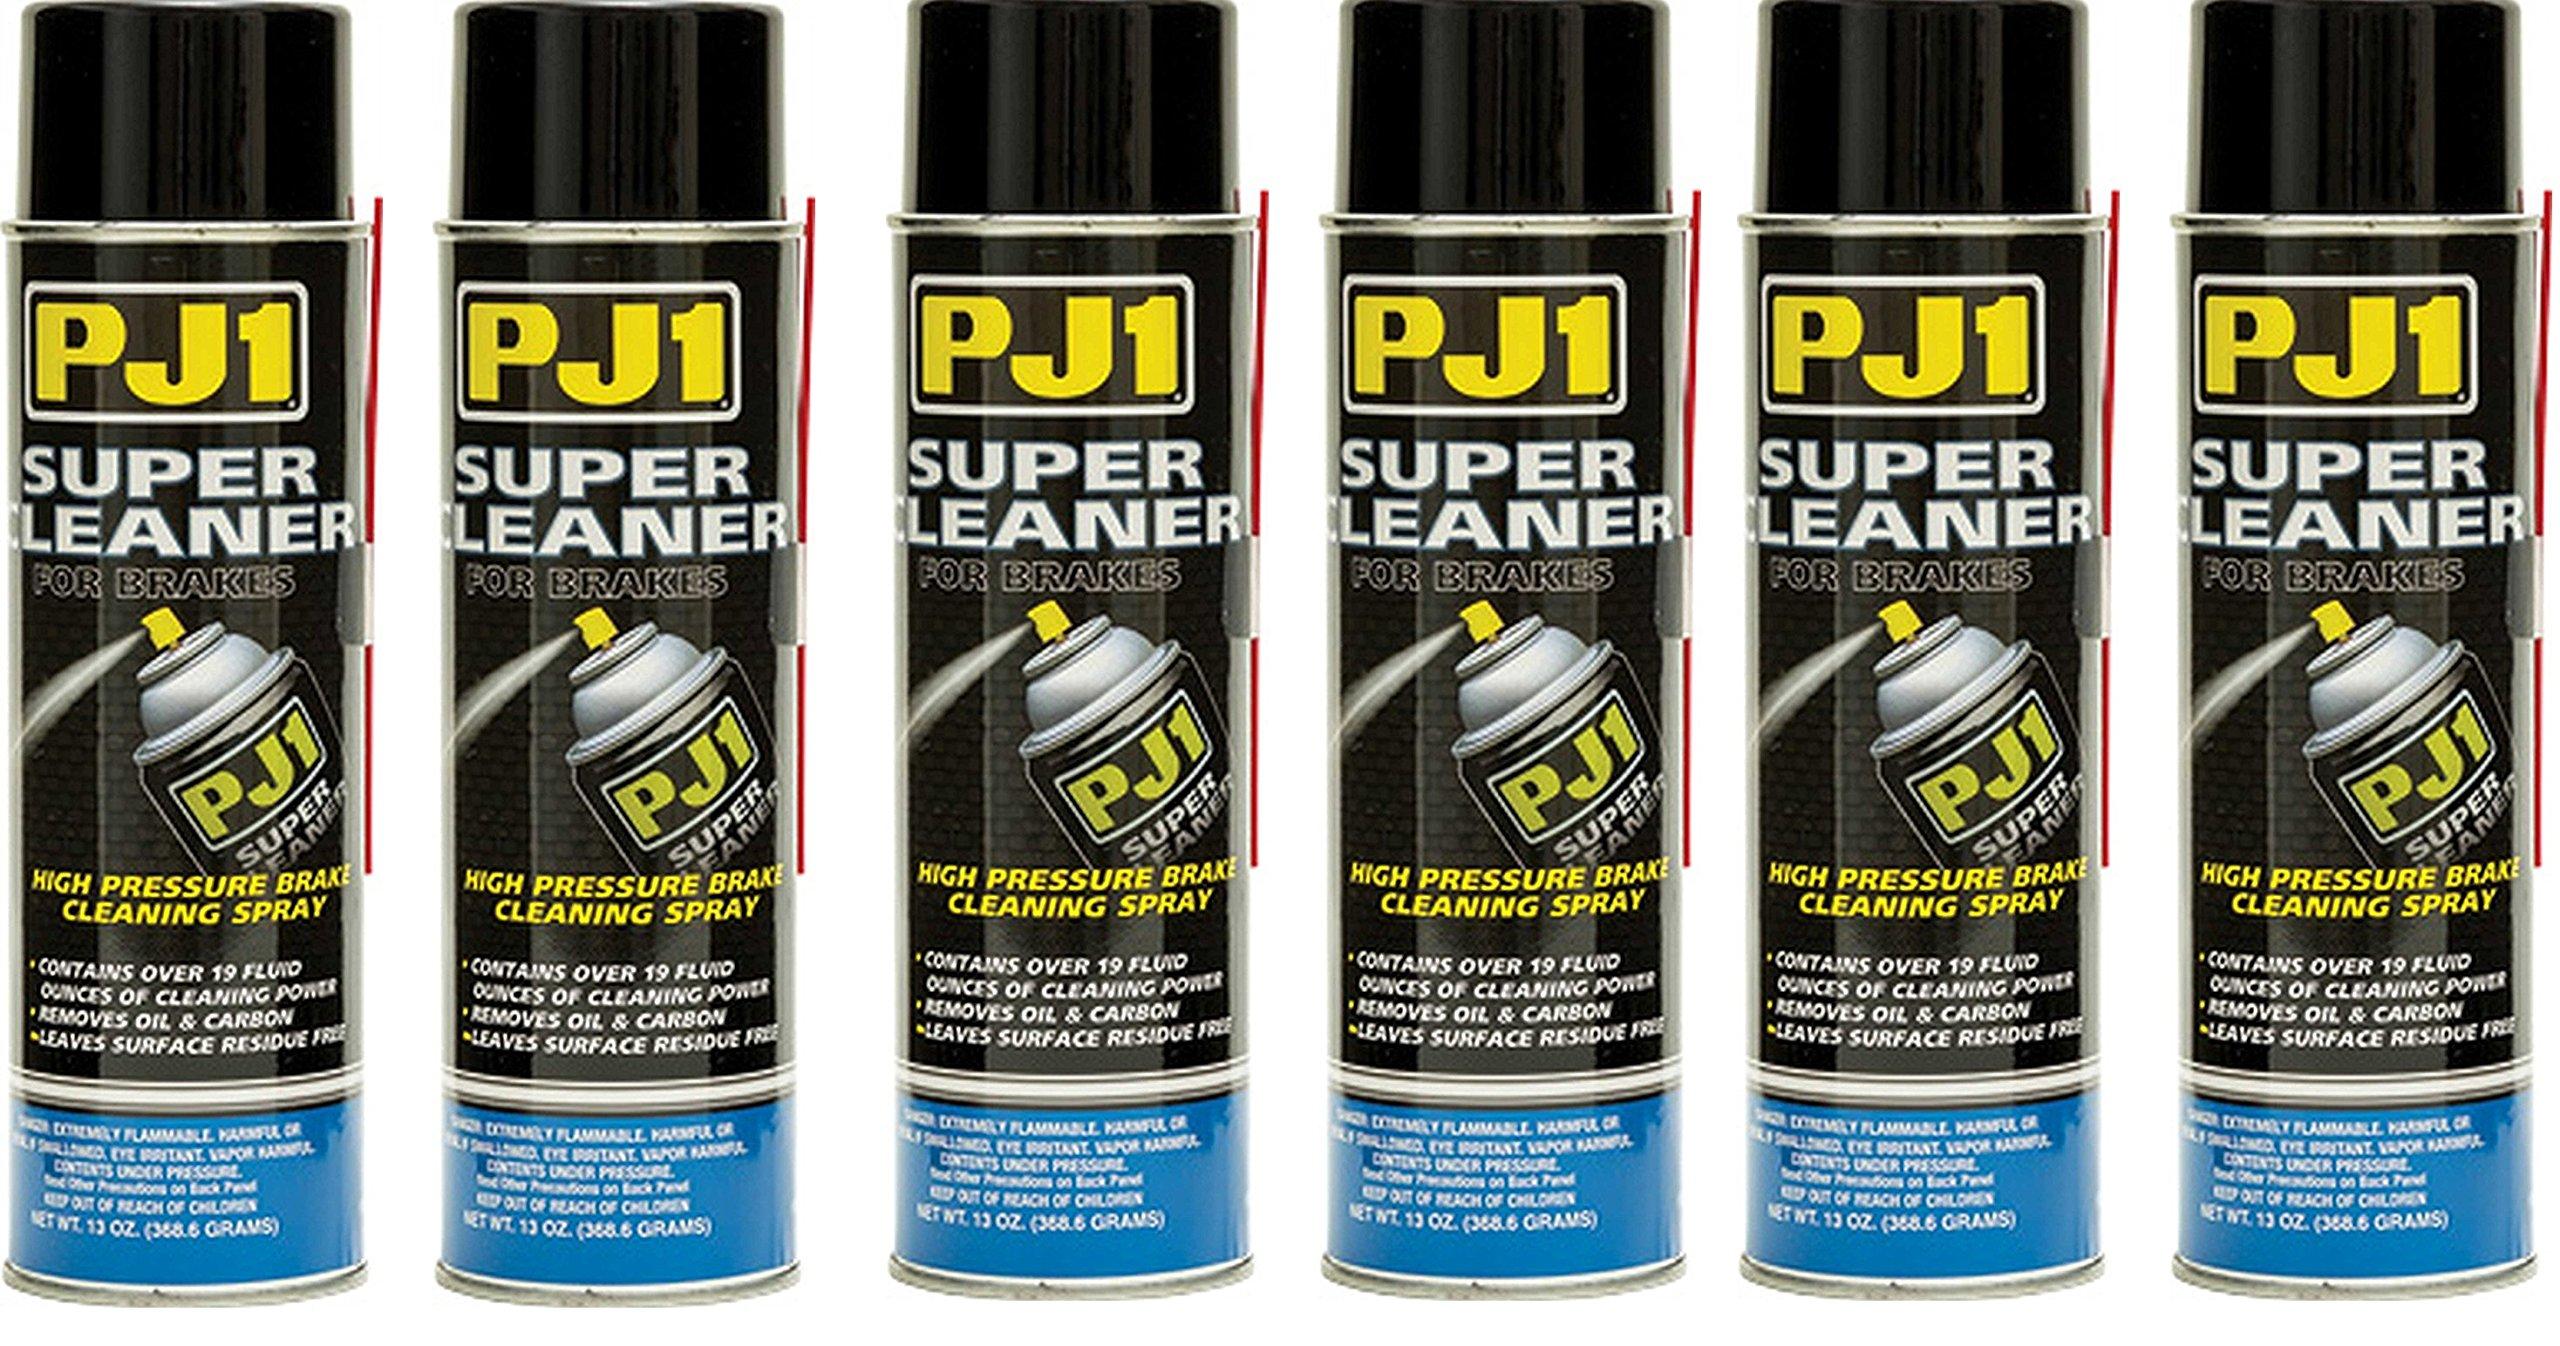 PJH BRANDS Pj1/Vht Pj1 Contact Cleaner 3-20 (6)